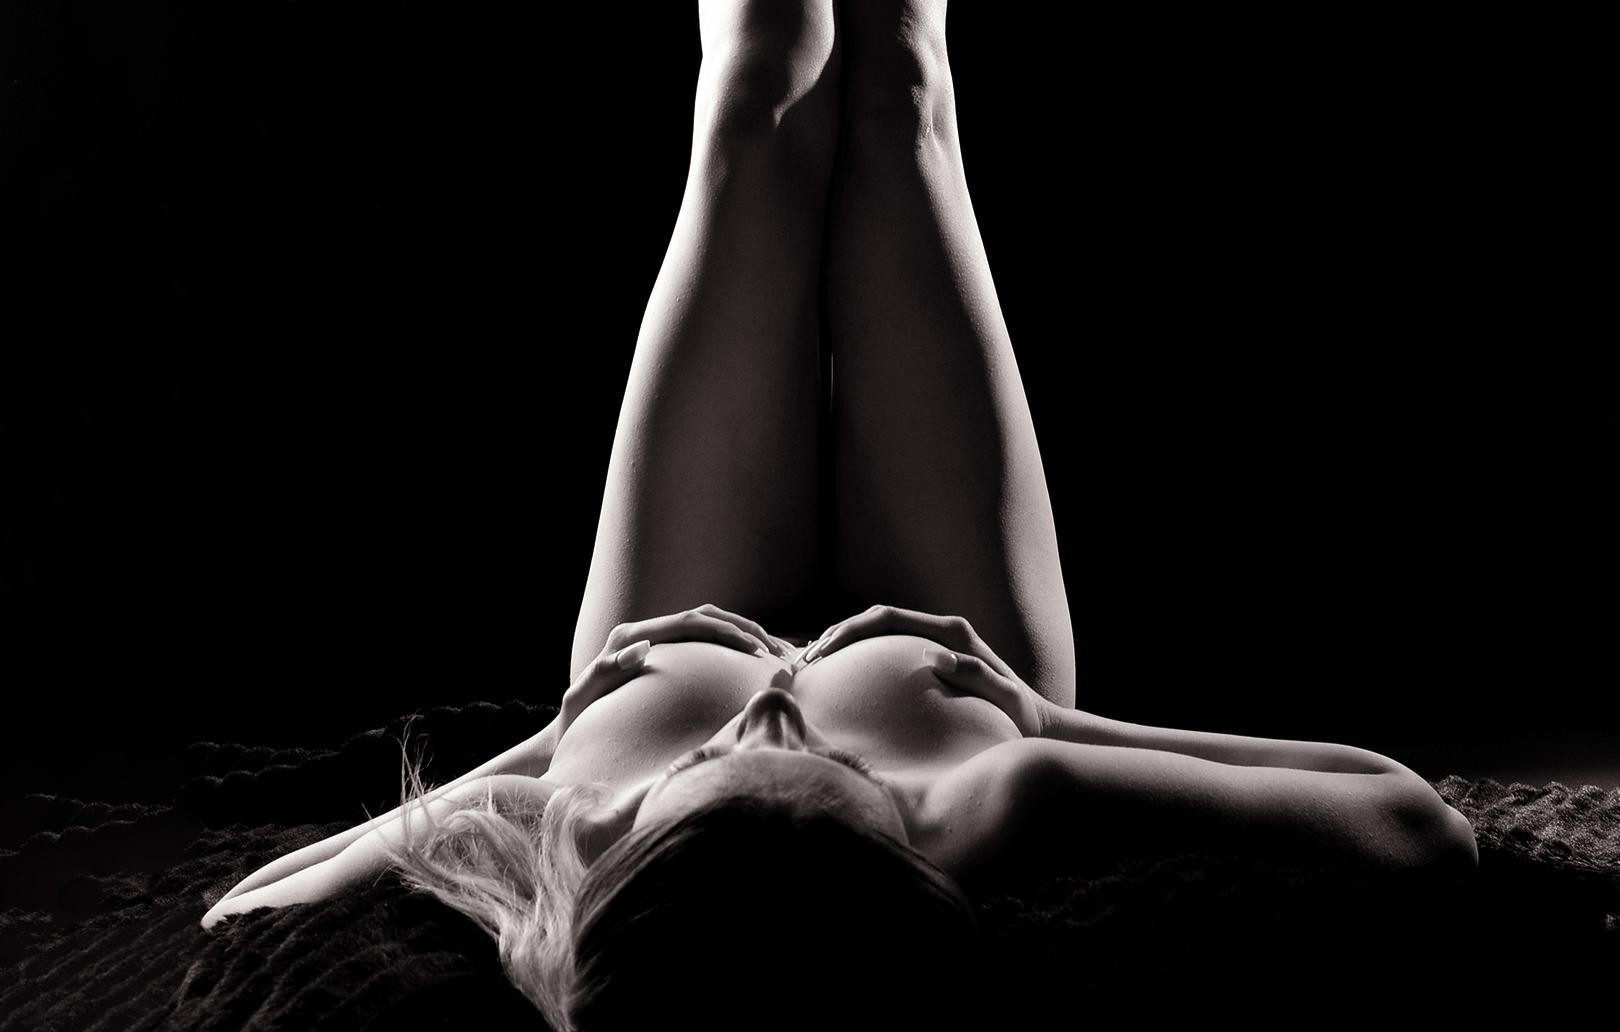 erotisches-fotoshooting-erfurt-bg21610532516